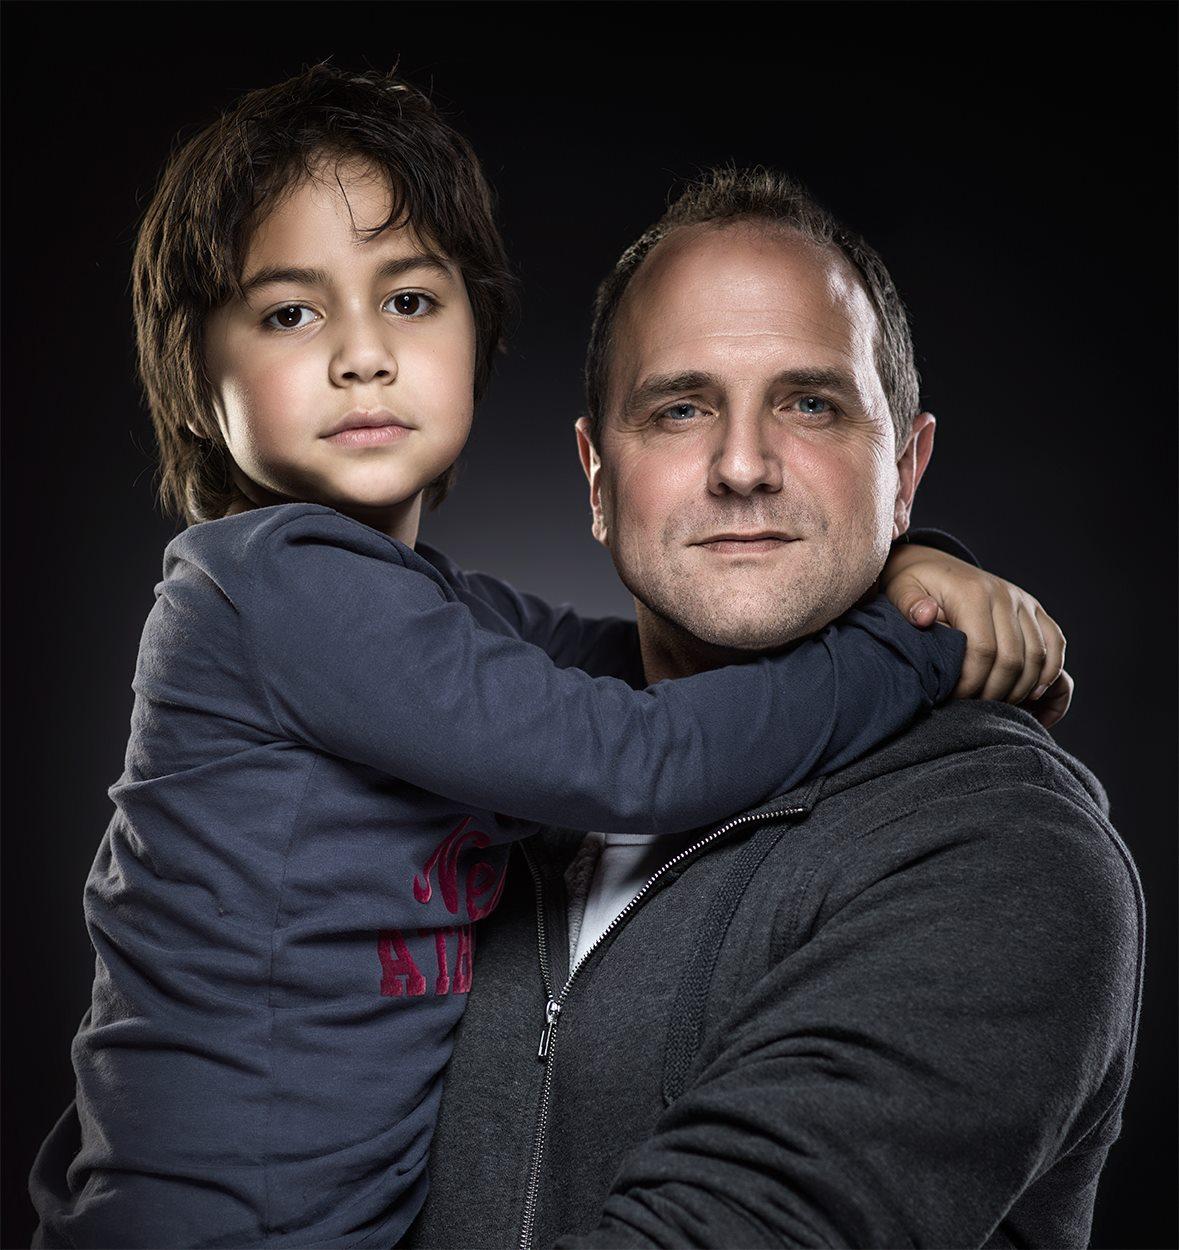 Adrian Sommeling et son fils Nic, Pays-Bas